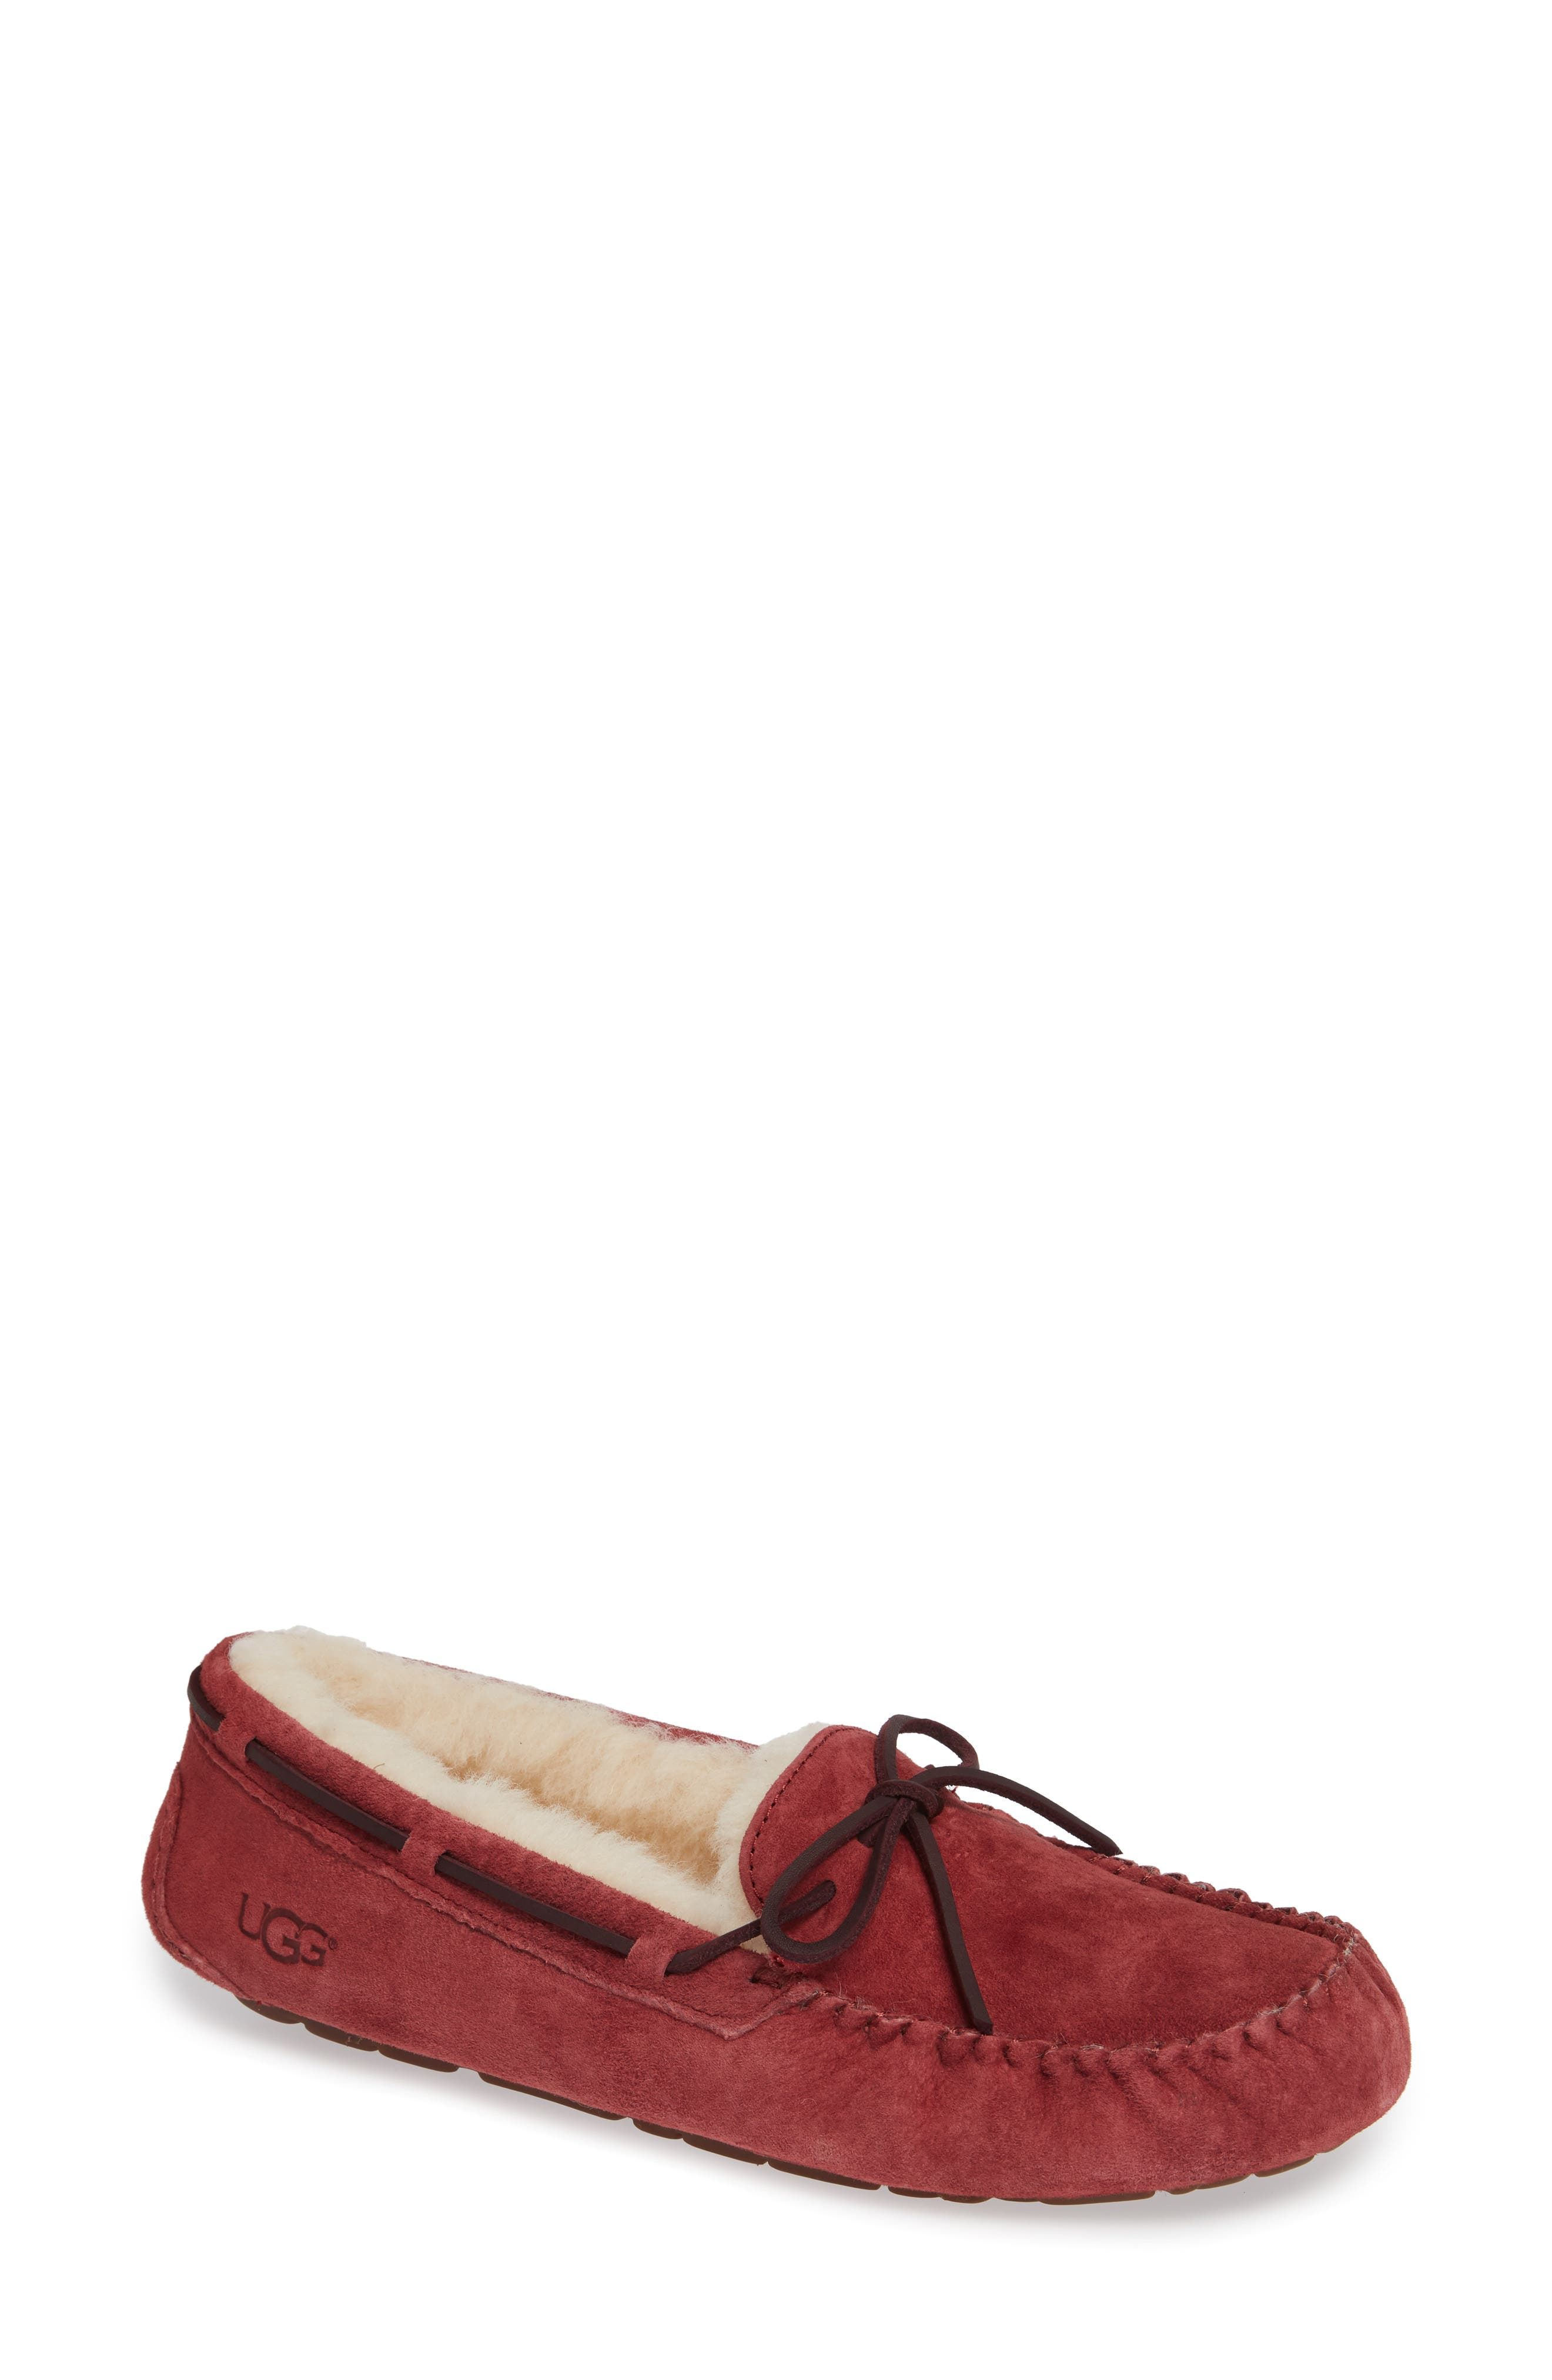 Ugg Dakota Water Resistant Slipper, Red